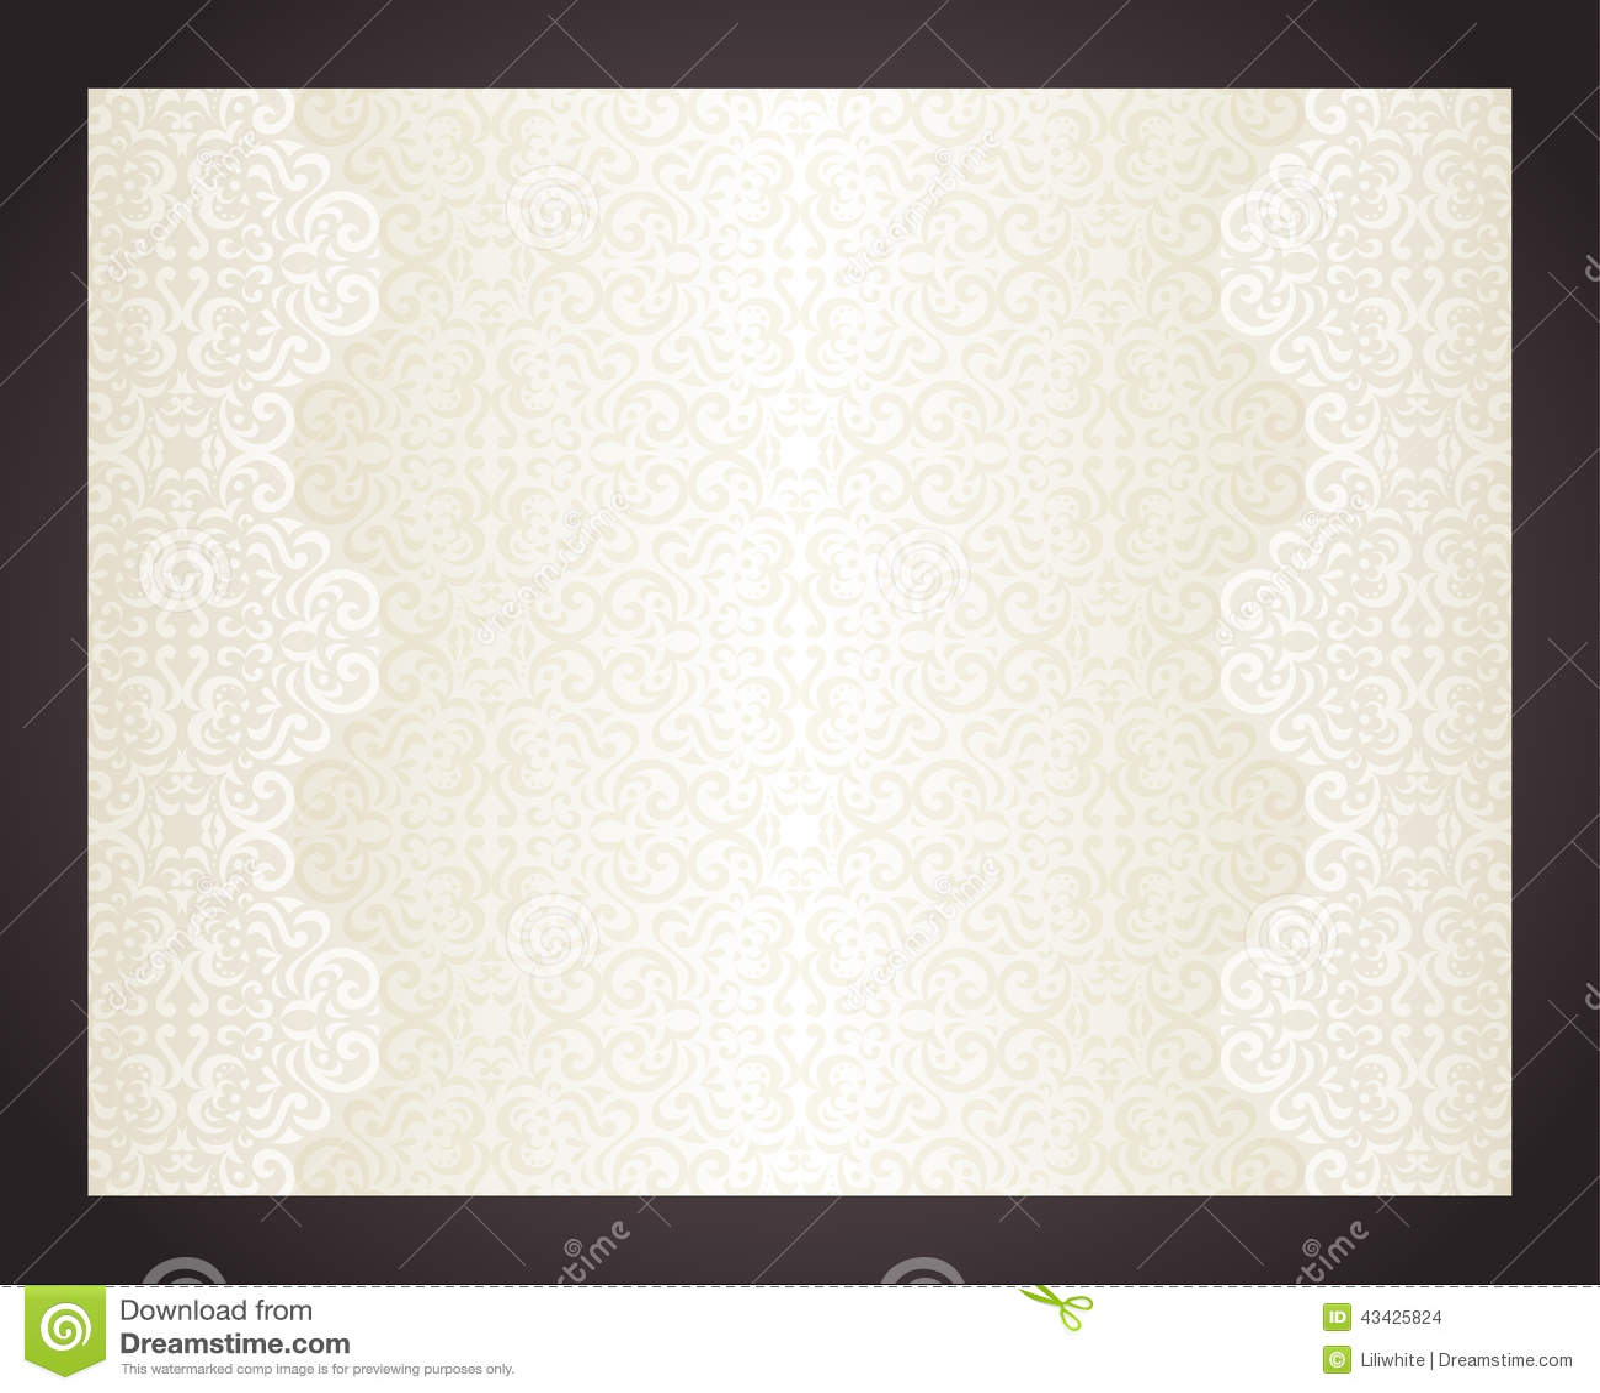 Luxury Cream Background In Vintage Style Stock Vector